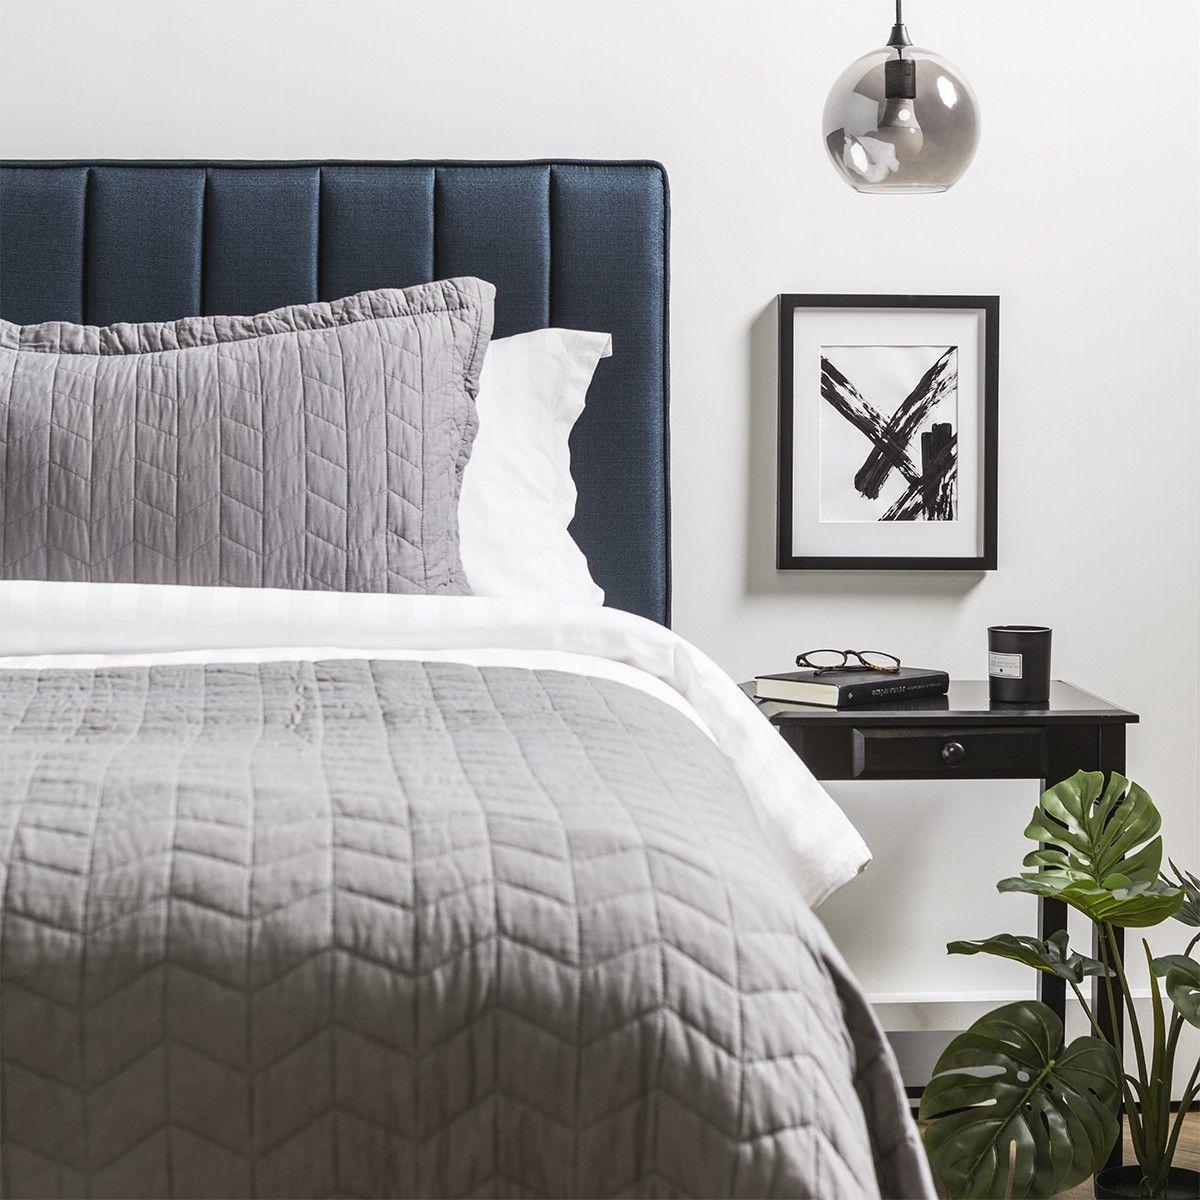 FLOBY Headboard Headboard, Bed frame, Furniture